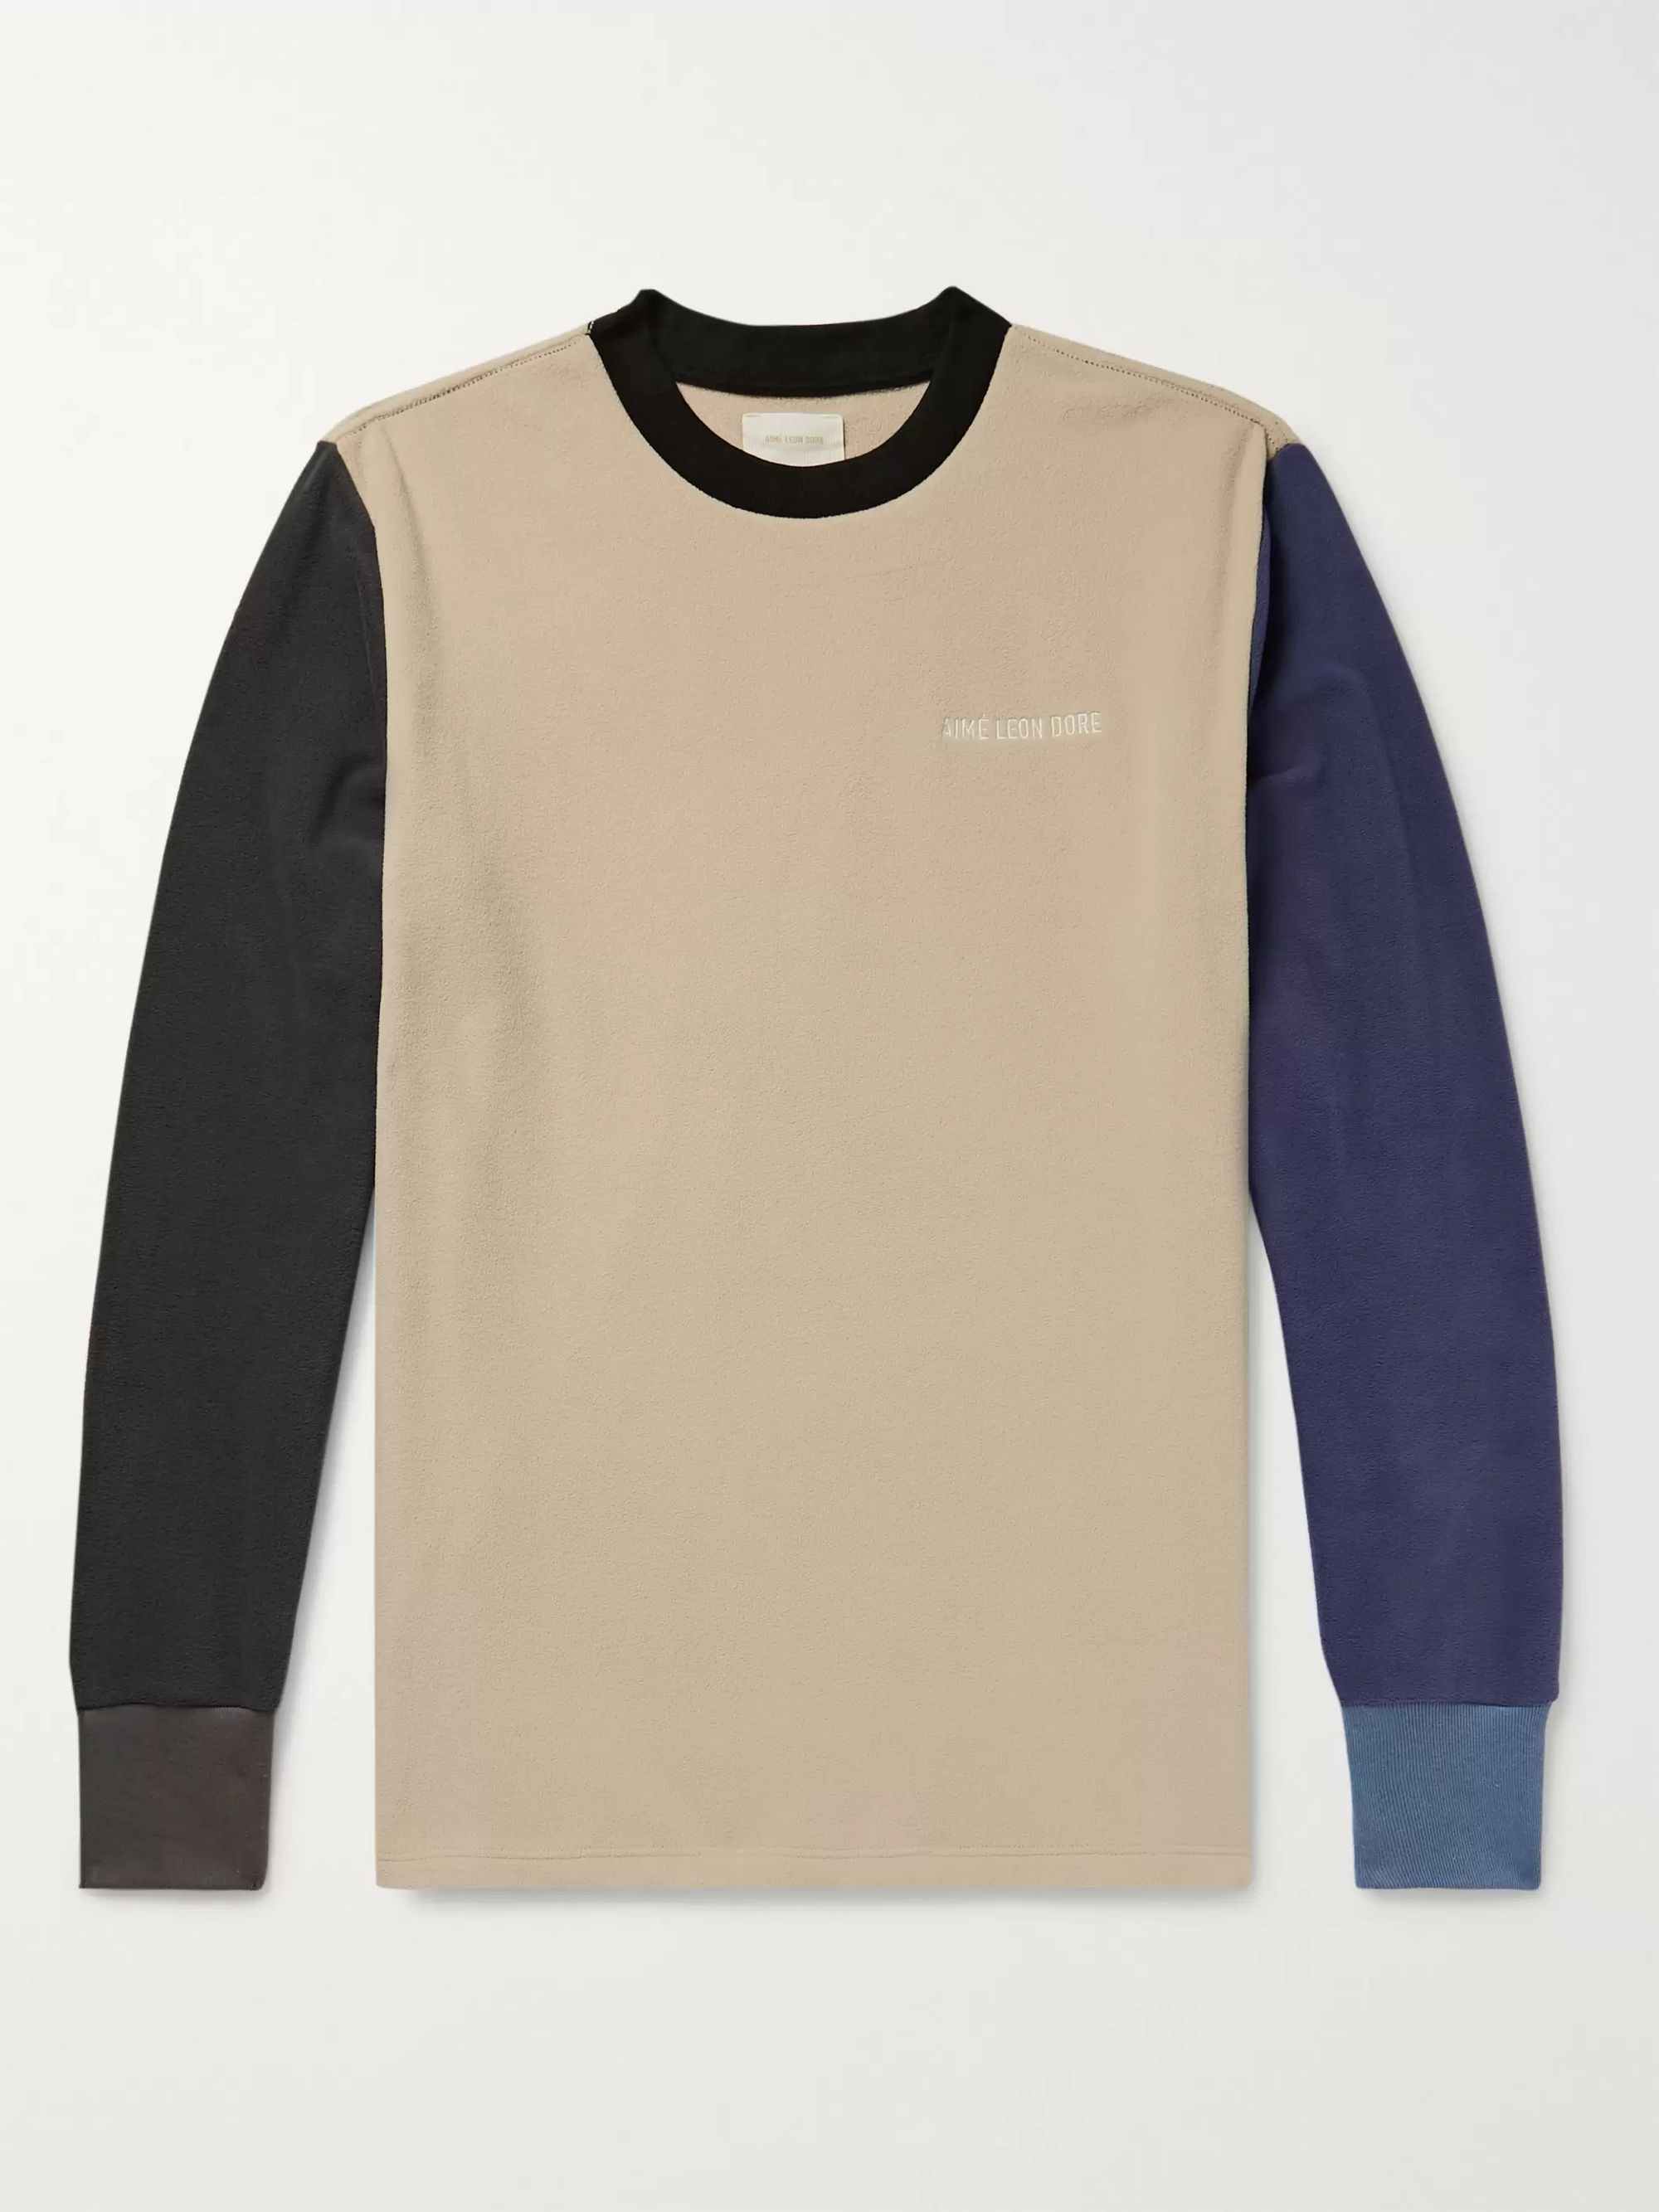 Logo Embroidered Colour Block Fleece Back Jersey Sweatshirt by Aimé Leon Dore